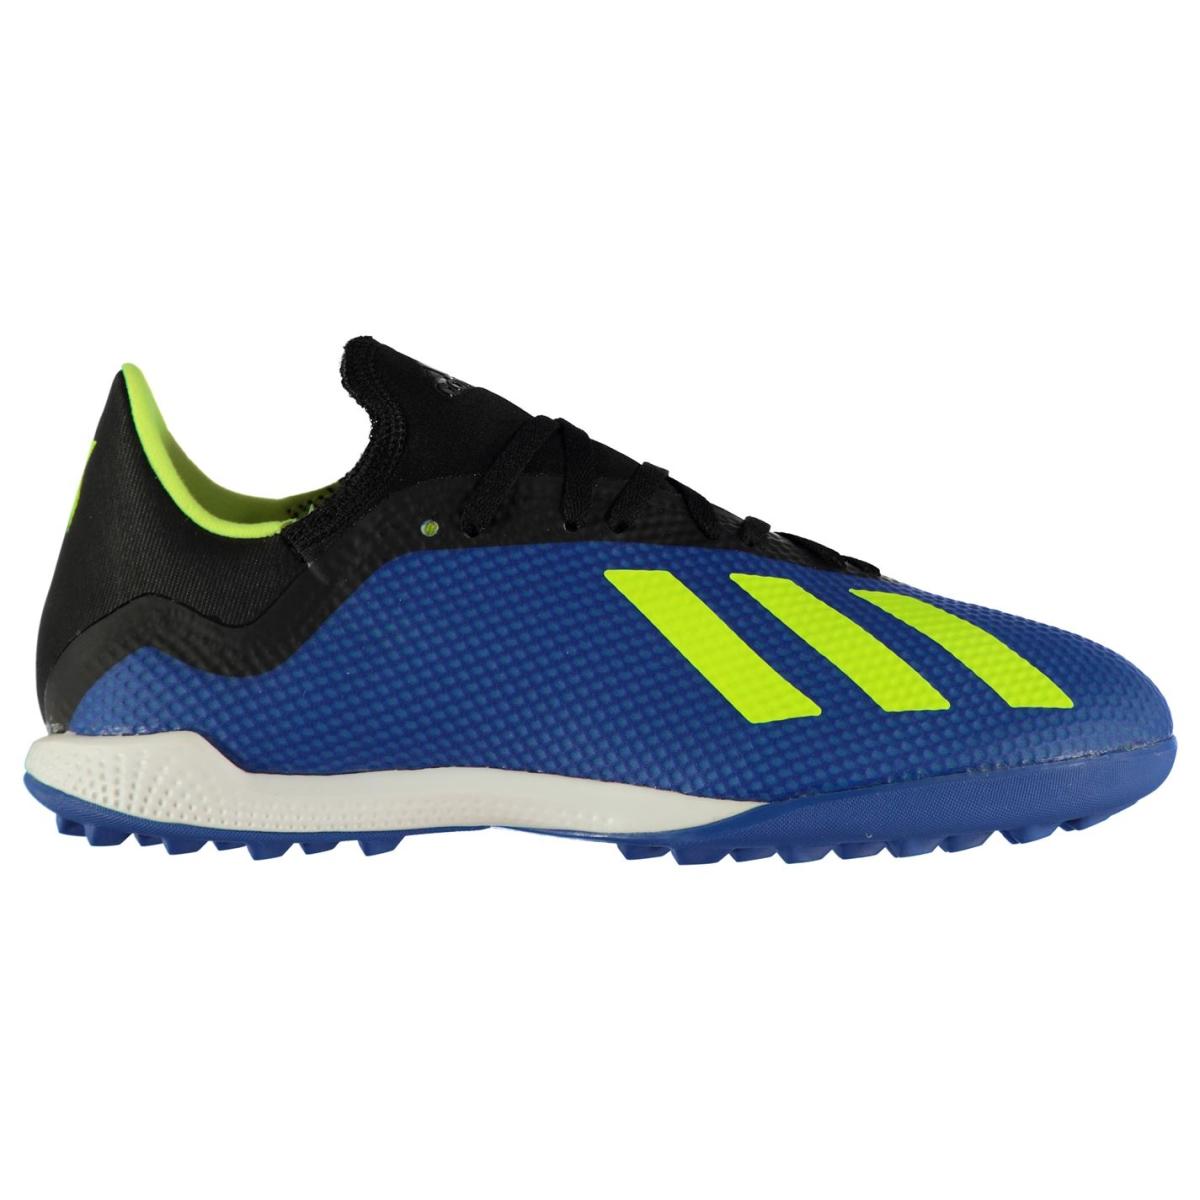 adidas X Tango 18.3 Tango Herren AT Astro Turf Kunstrasen Fußballschuhe